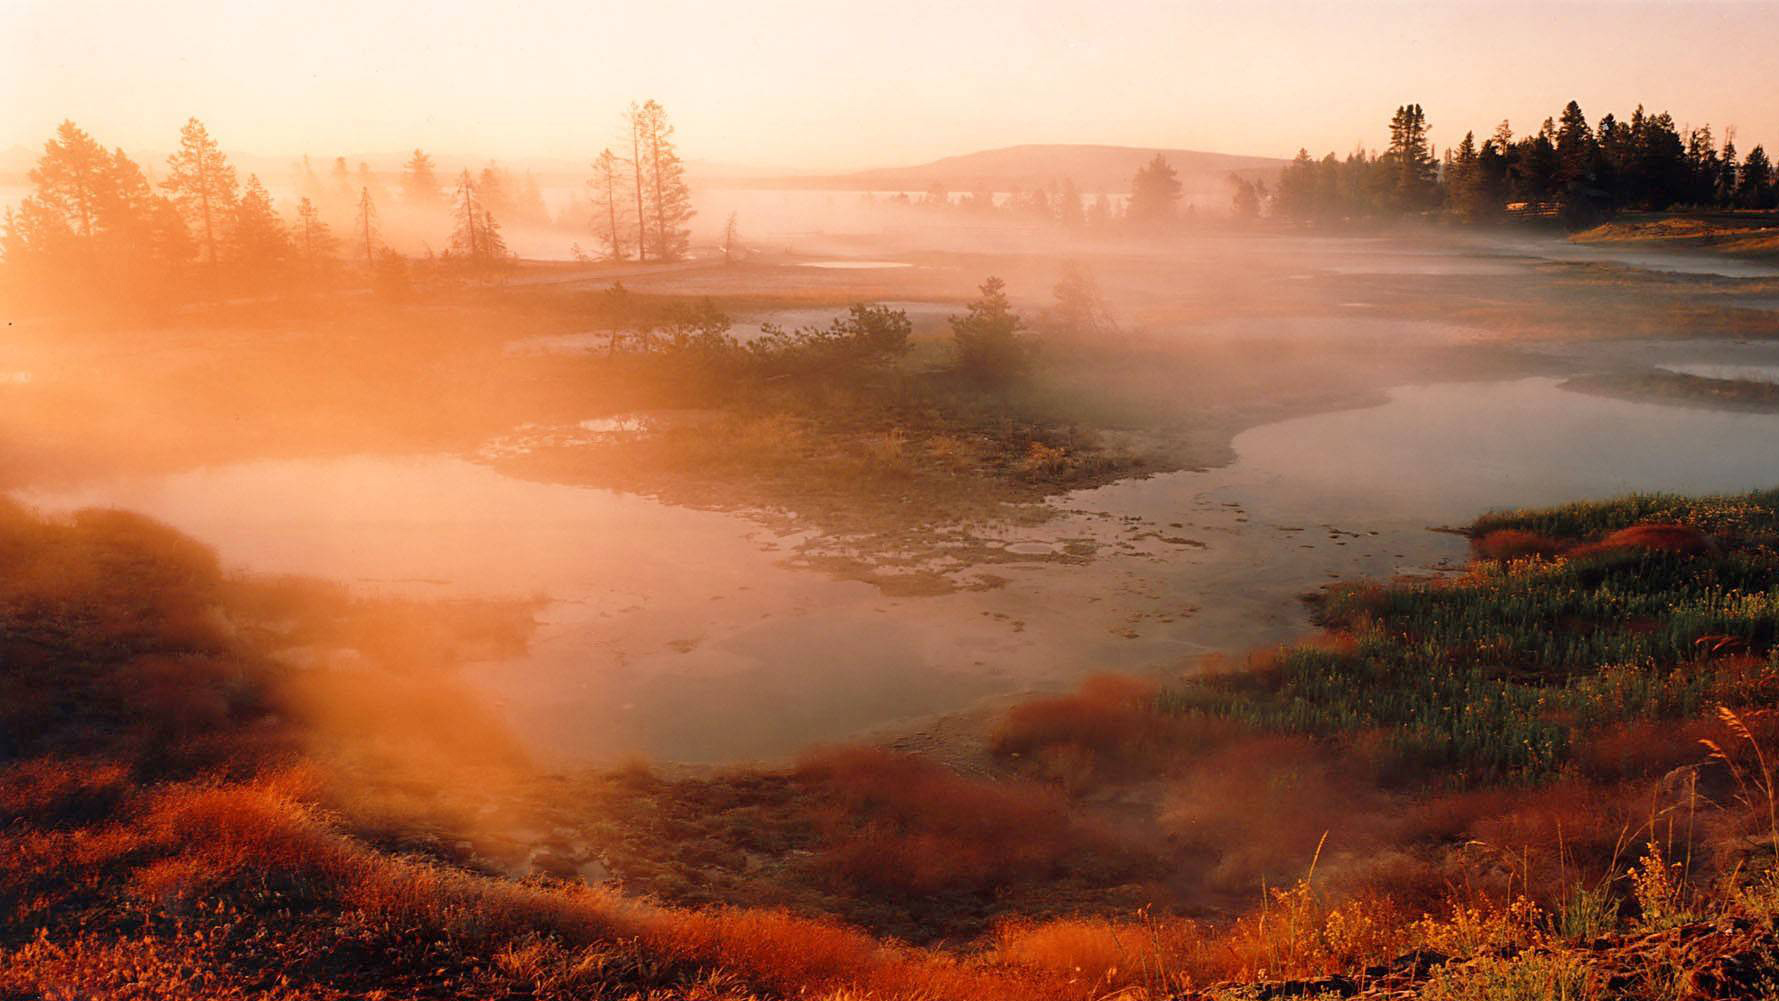 Park at Sunset, Yellowstone National Park, Wyoming, United States